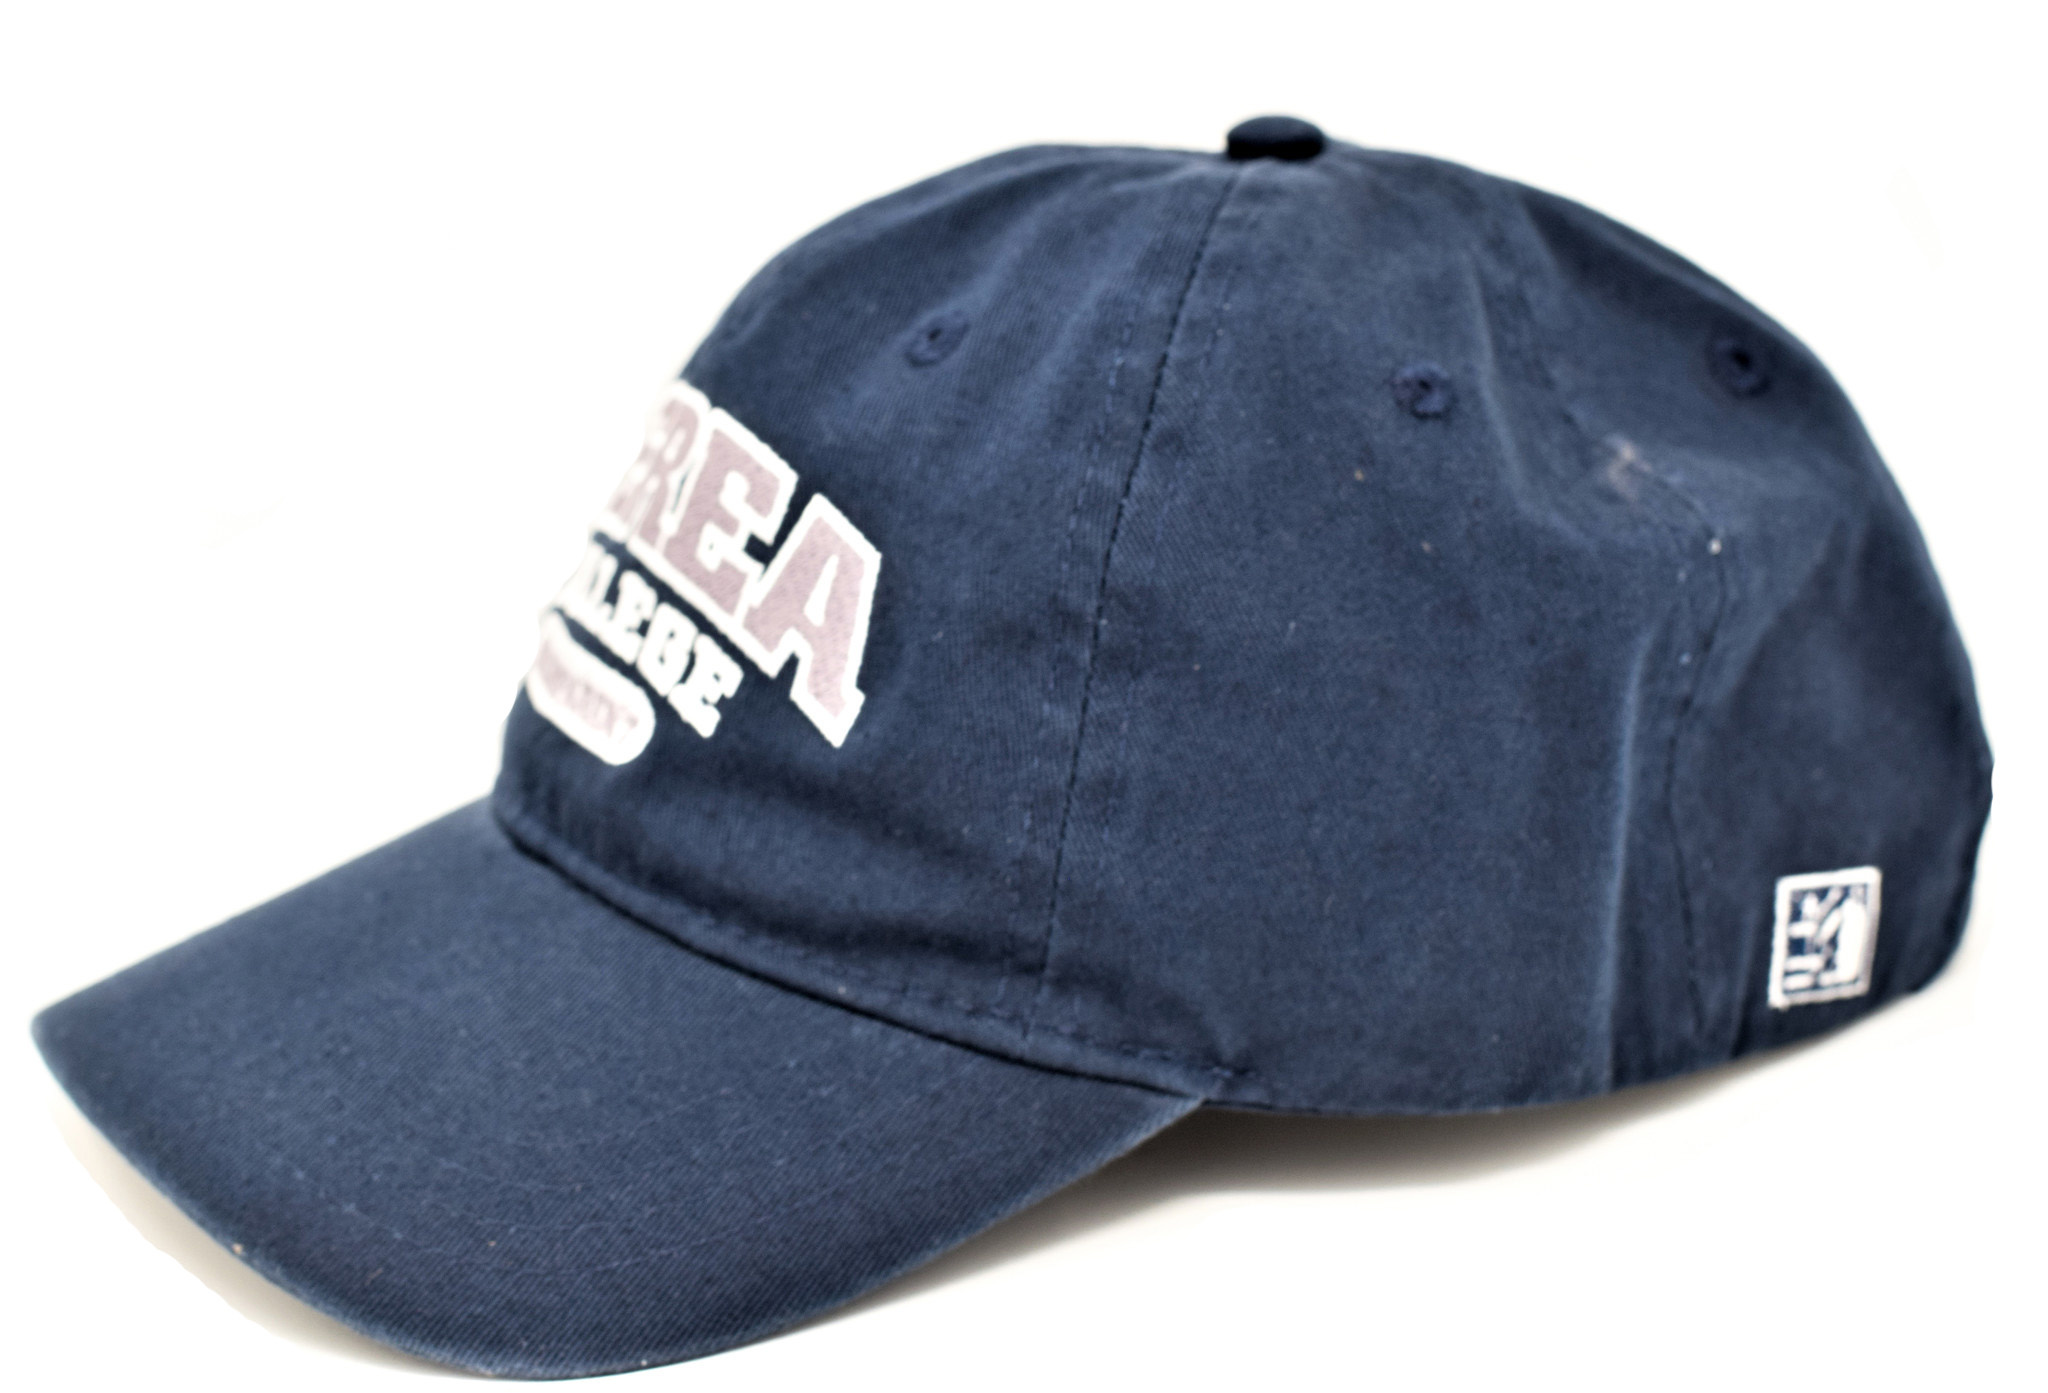 Ball Cap, Berea College Grandparent, Strap, Navy-2